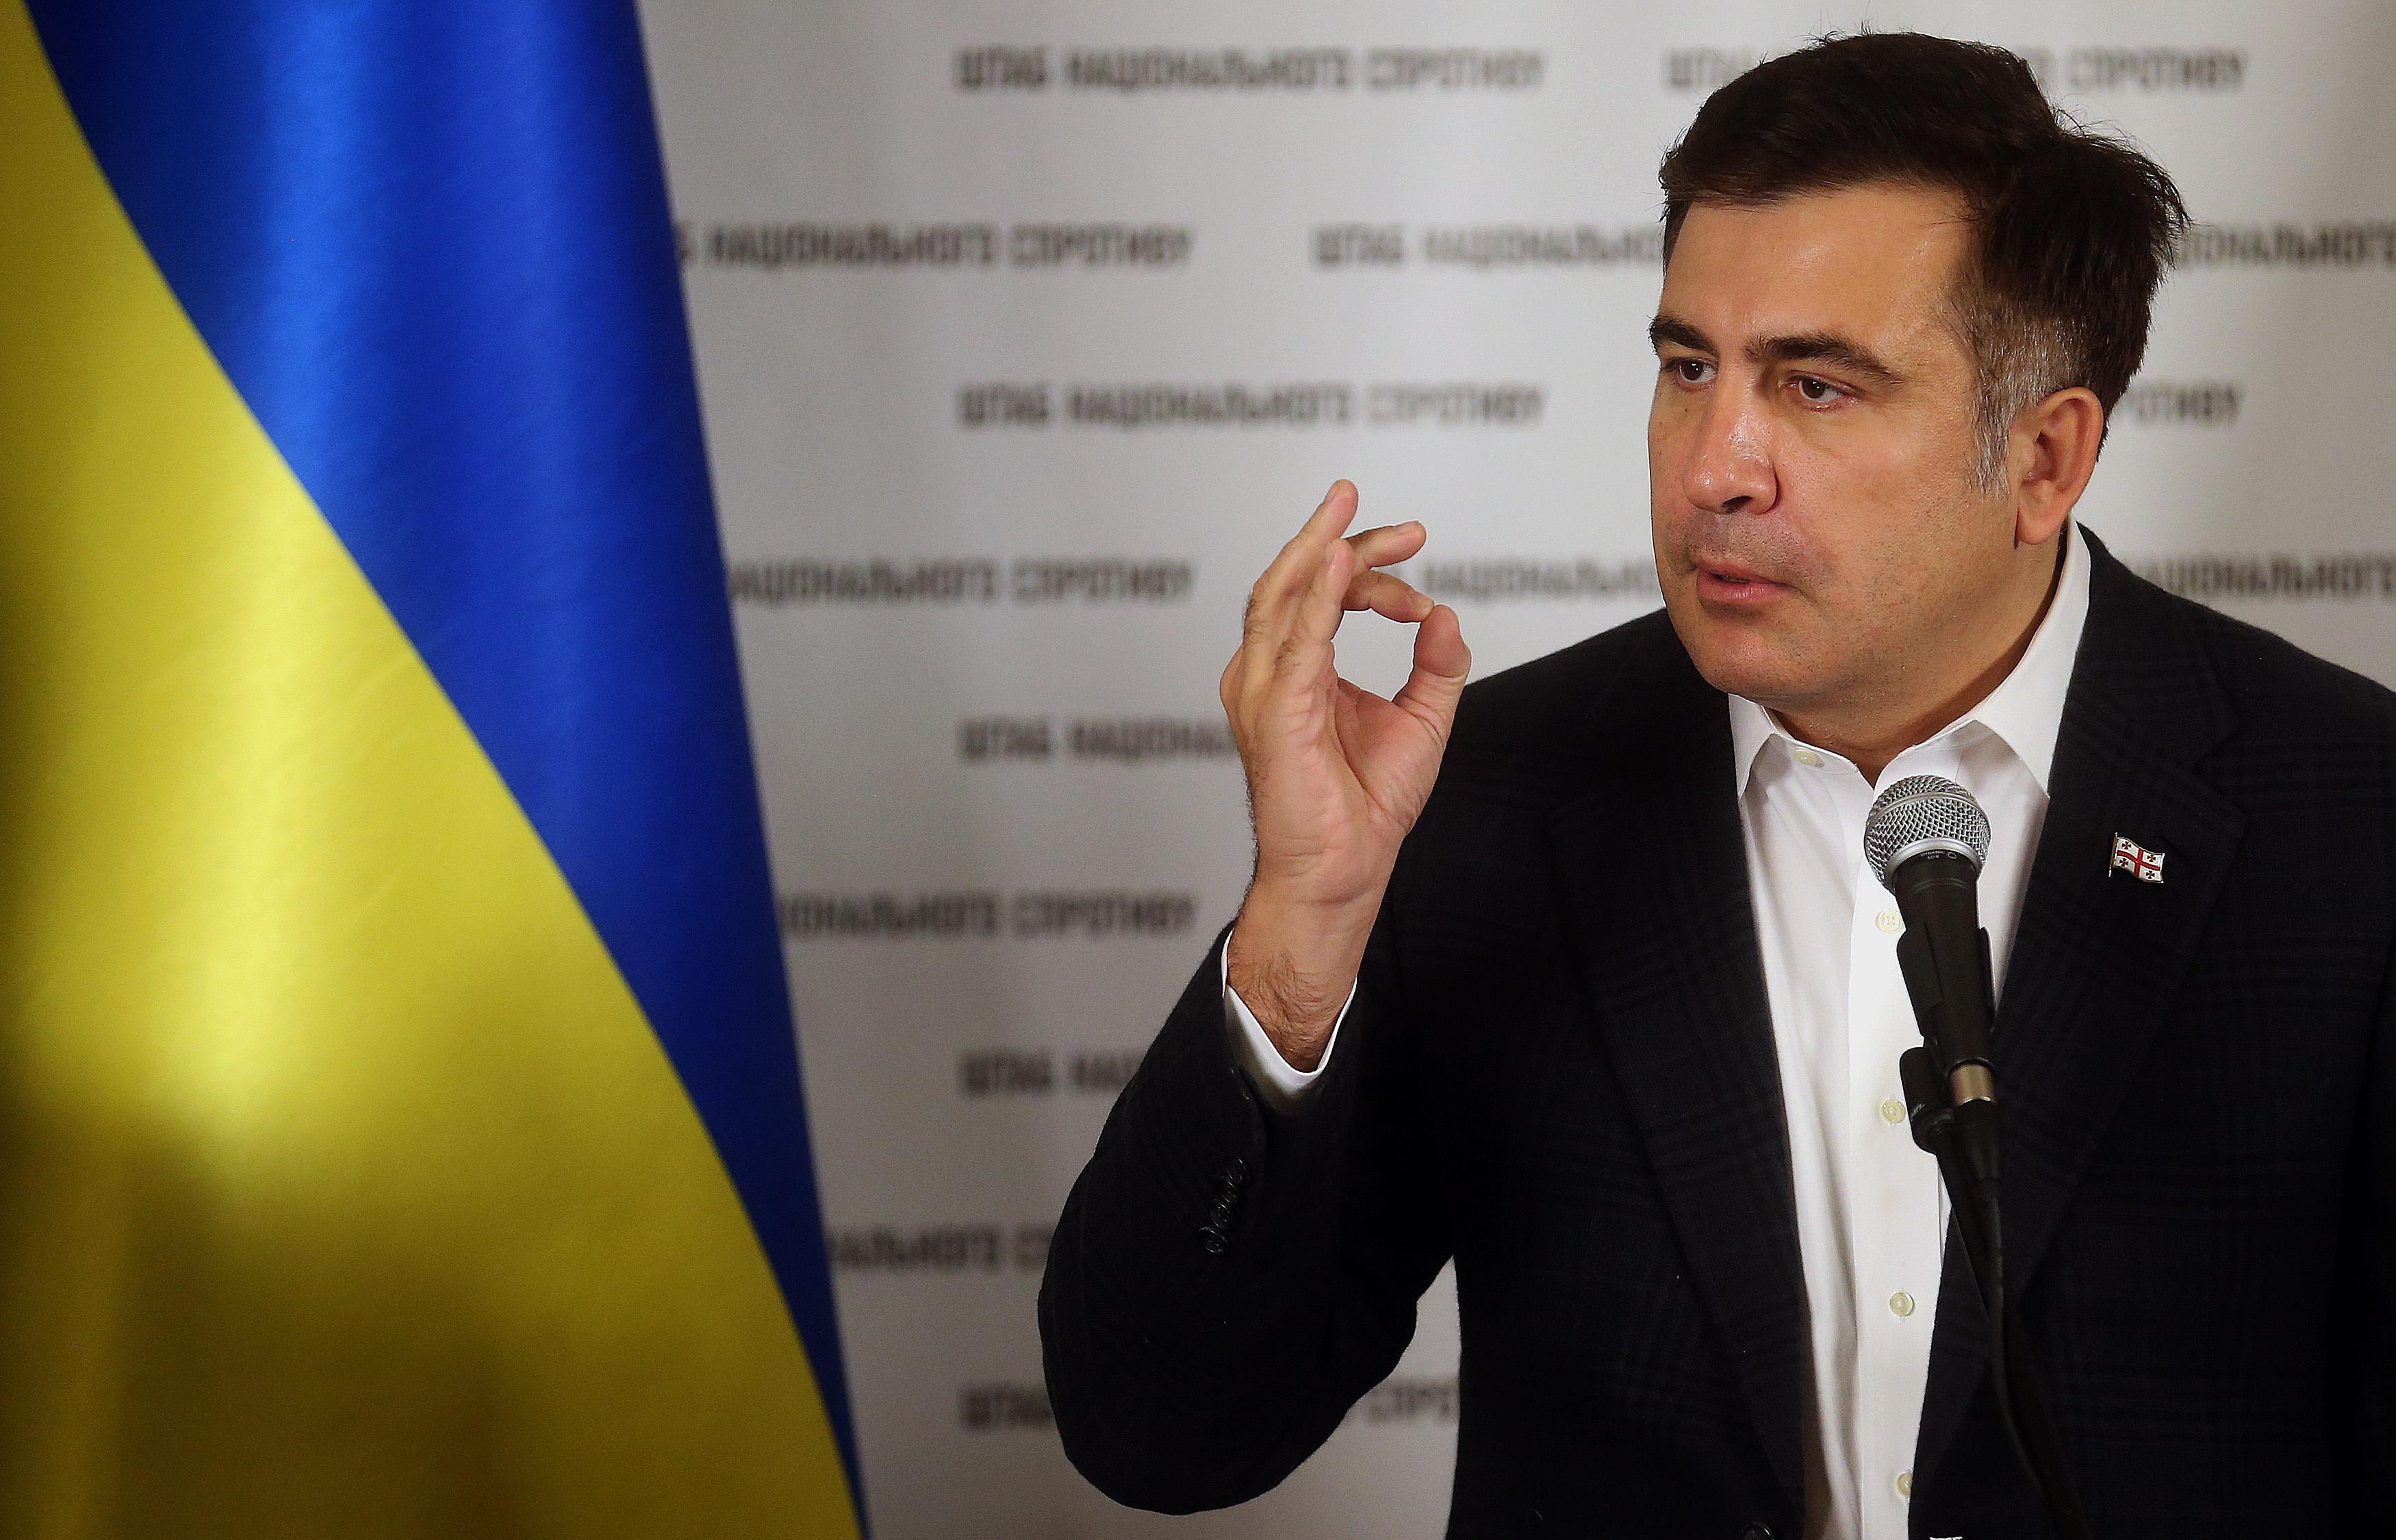 Саакашвили вГрузии встретят согласно закону— руководитель МВД